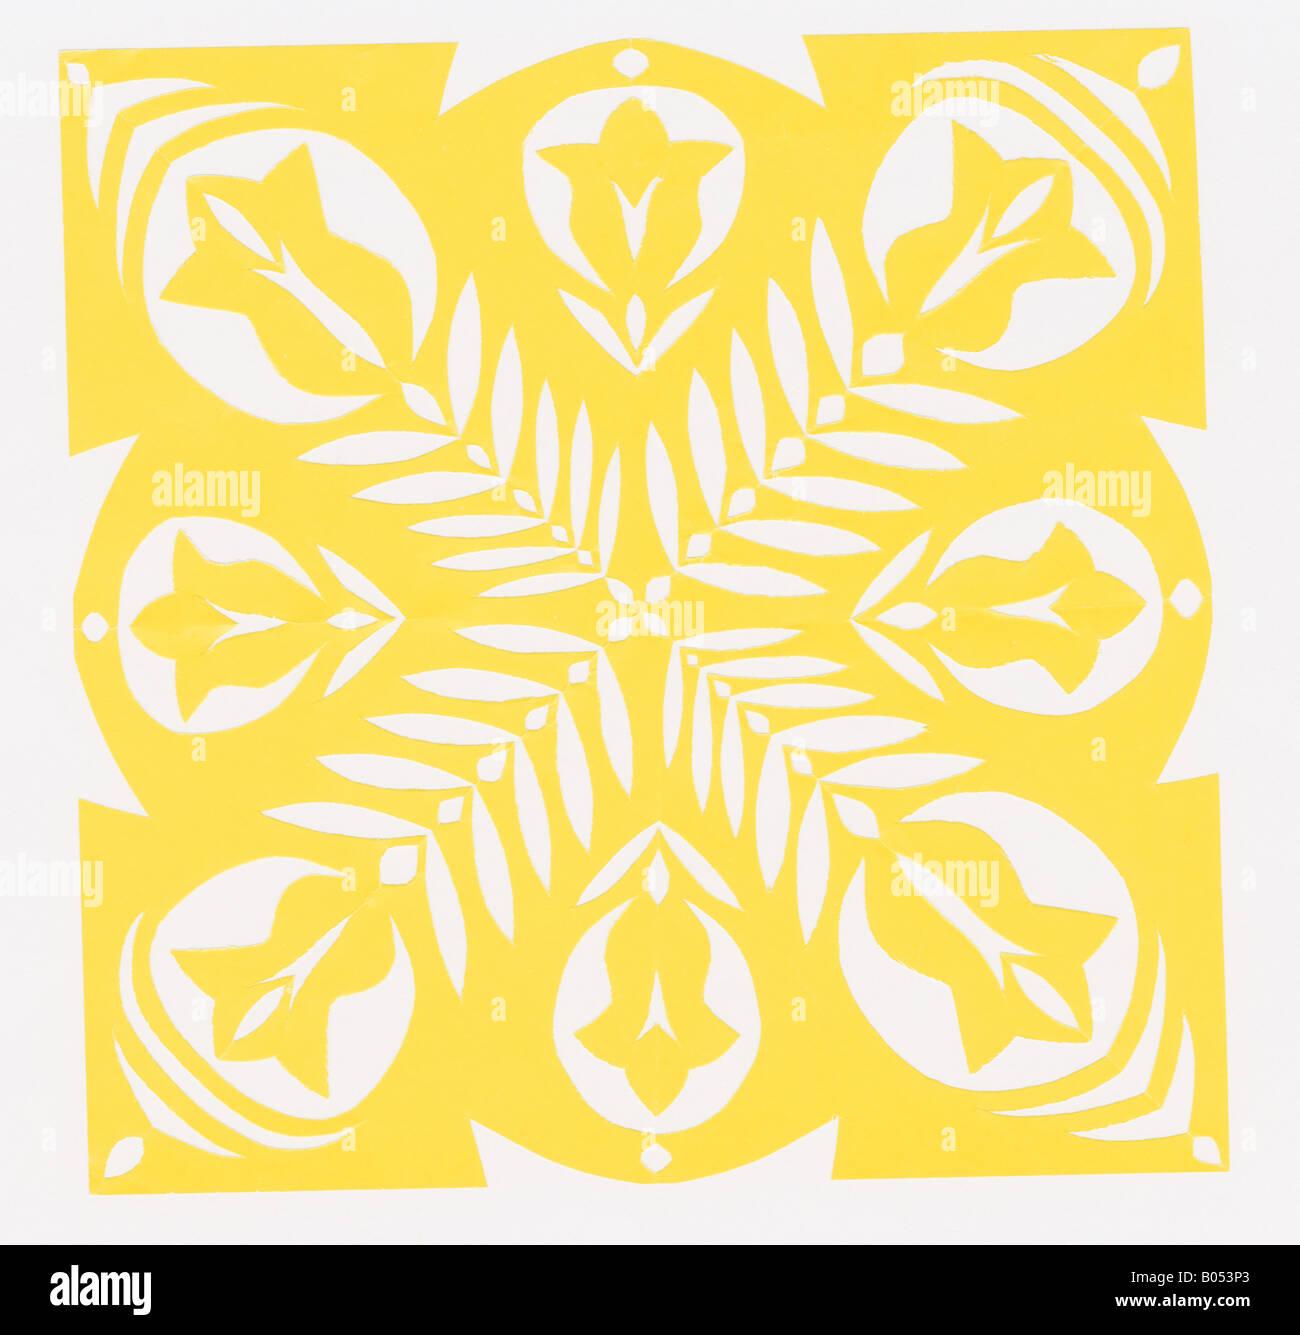 Contemporary Paper Cutting Floral Design Stockfotos & Contemporary ...